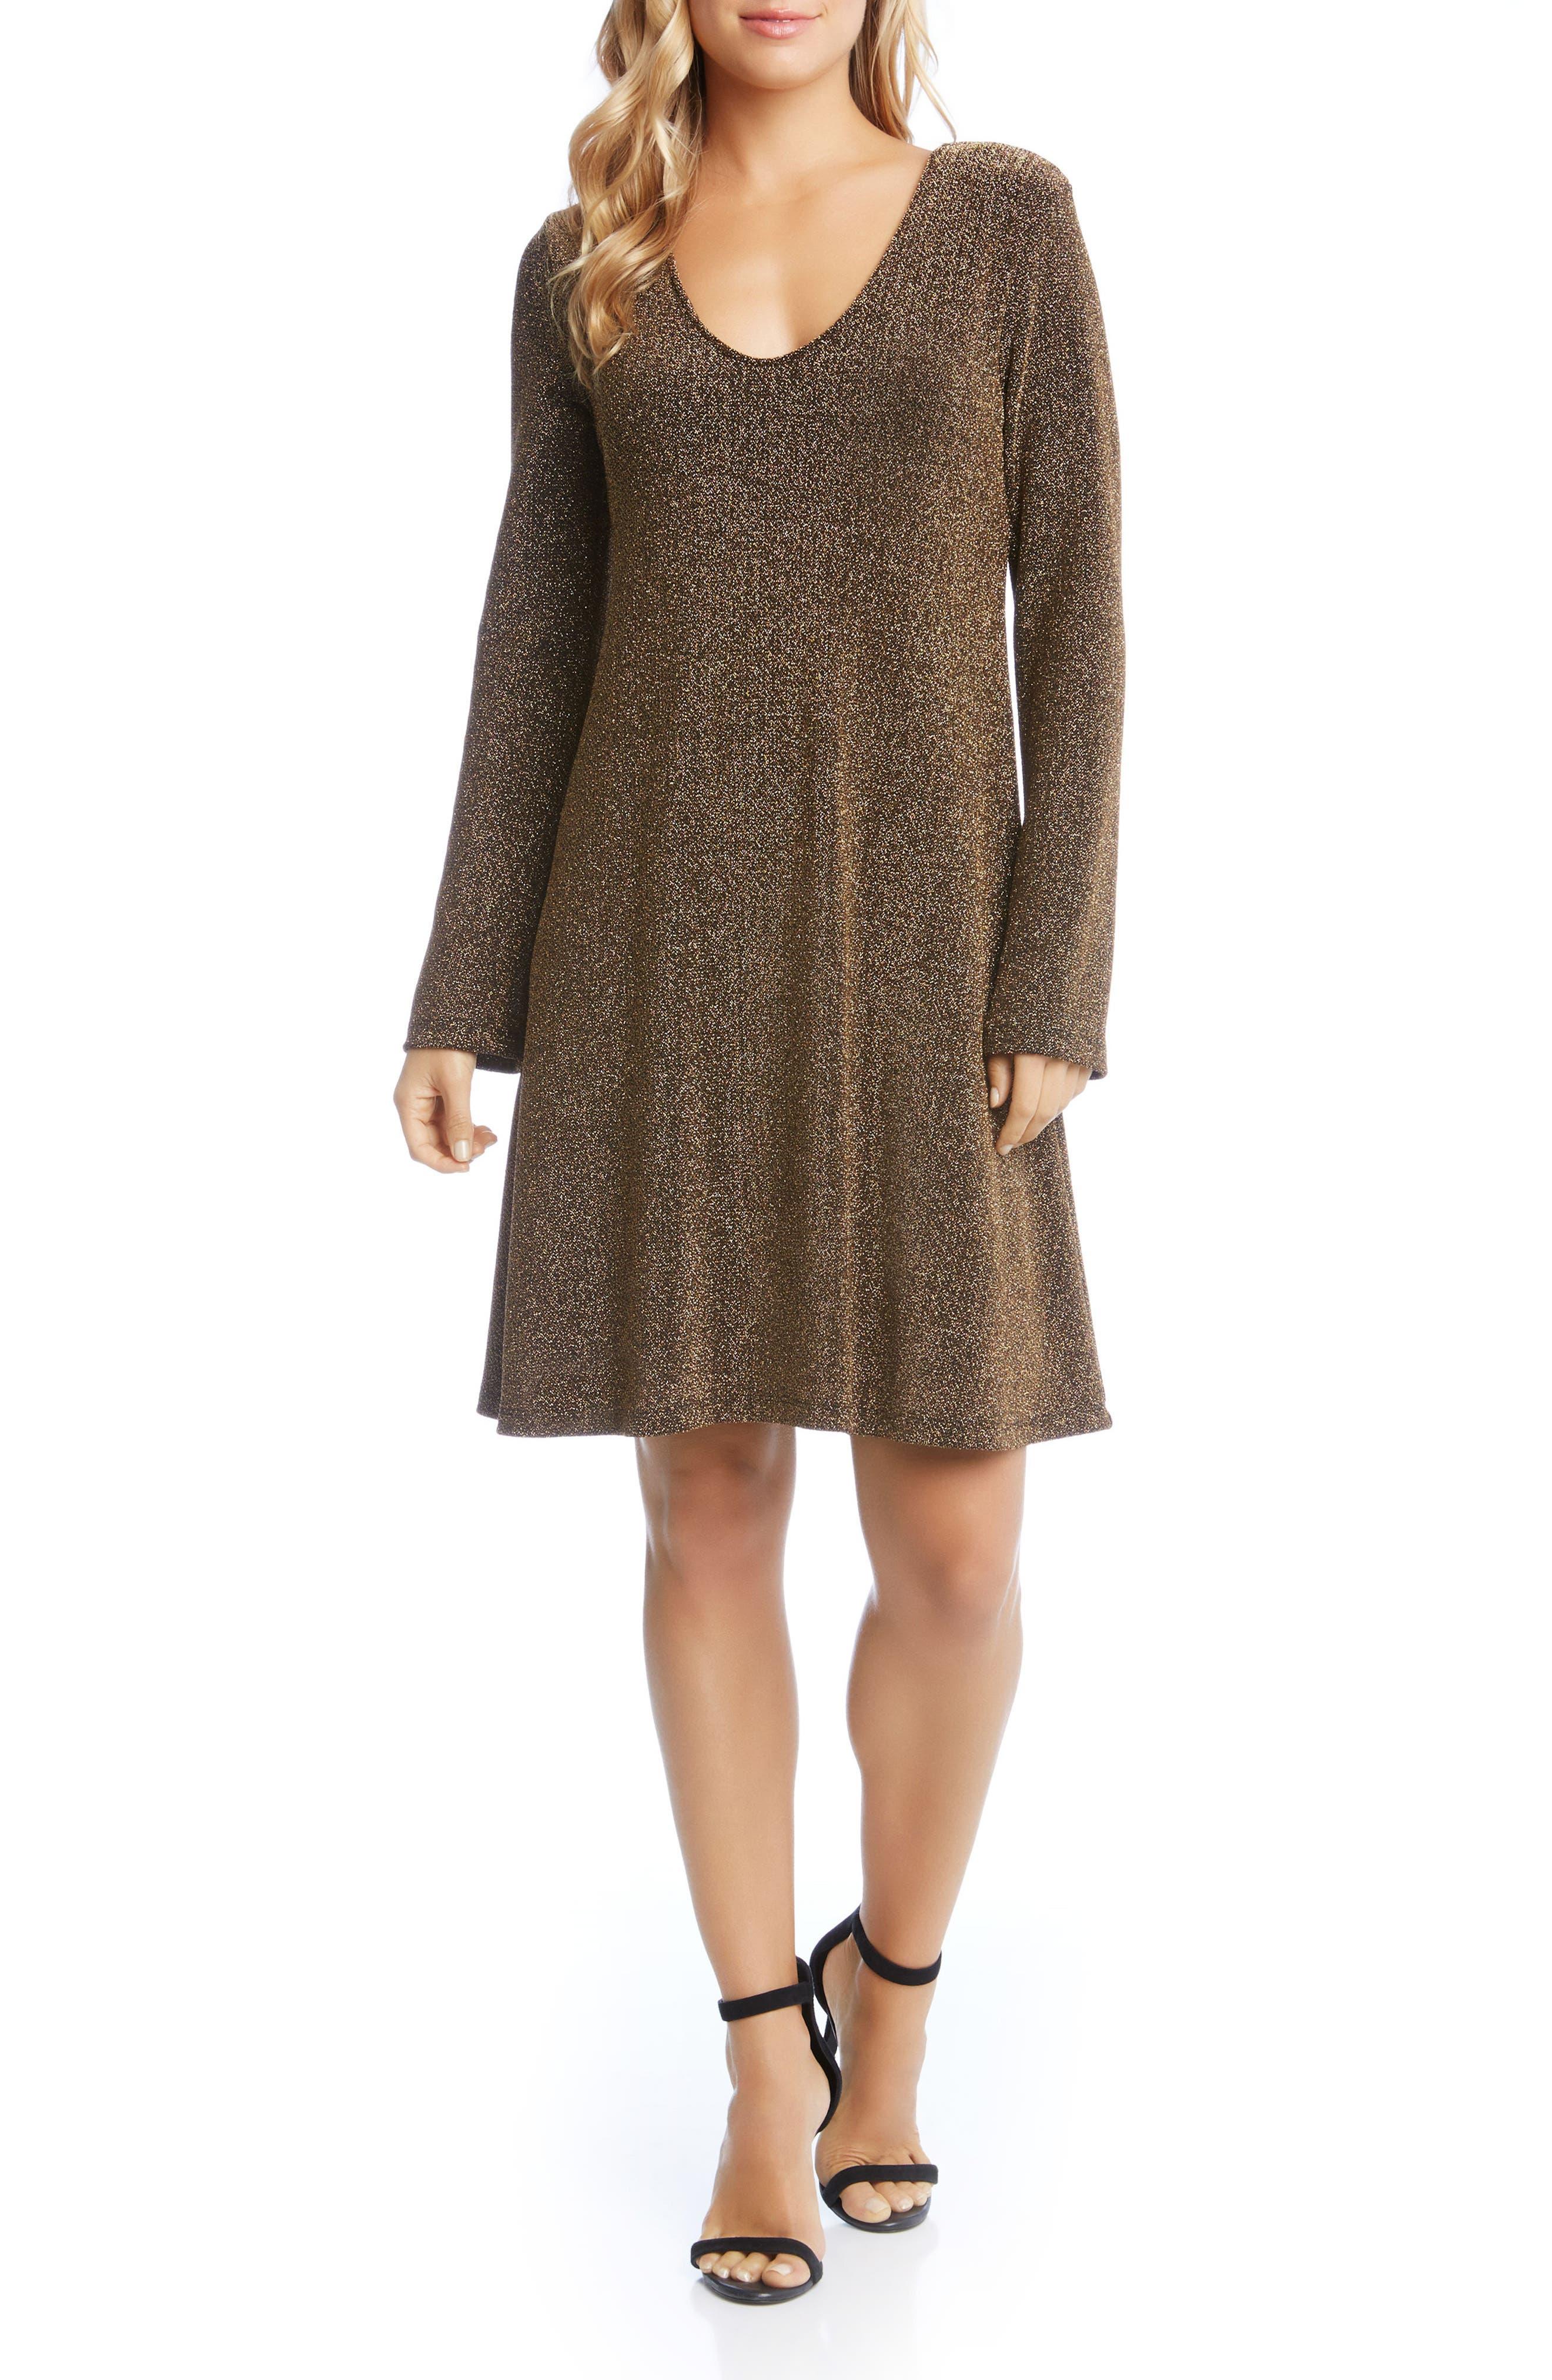 Gold Knit Taylor Dress,                         Main,                         color, 710